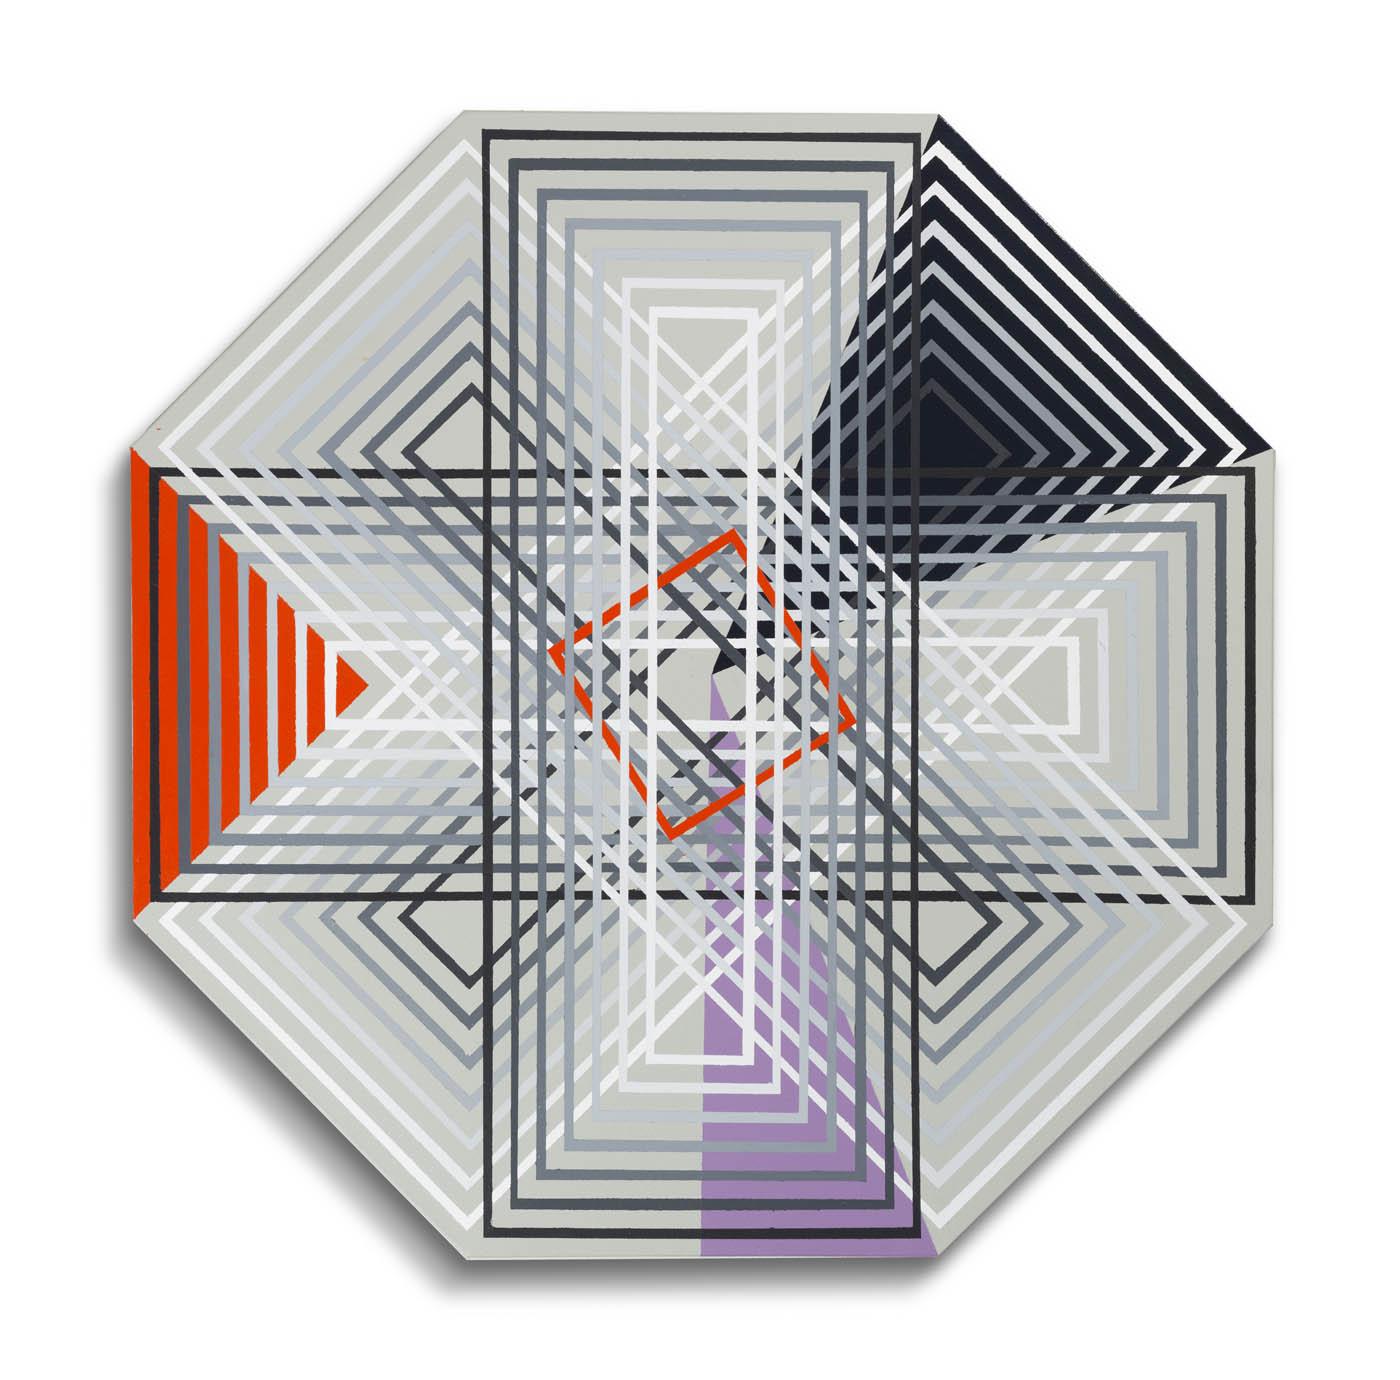 Clark E. Goeman - Octagon No. 1